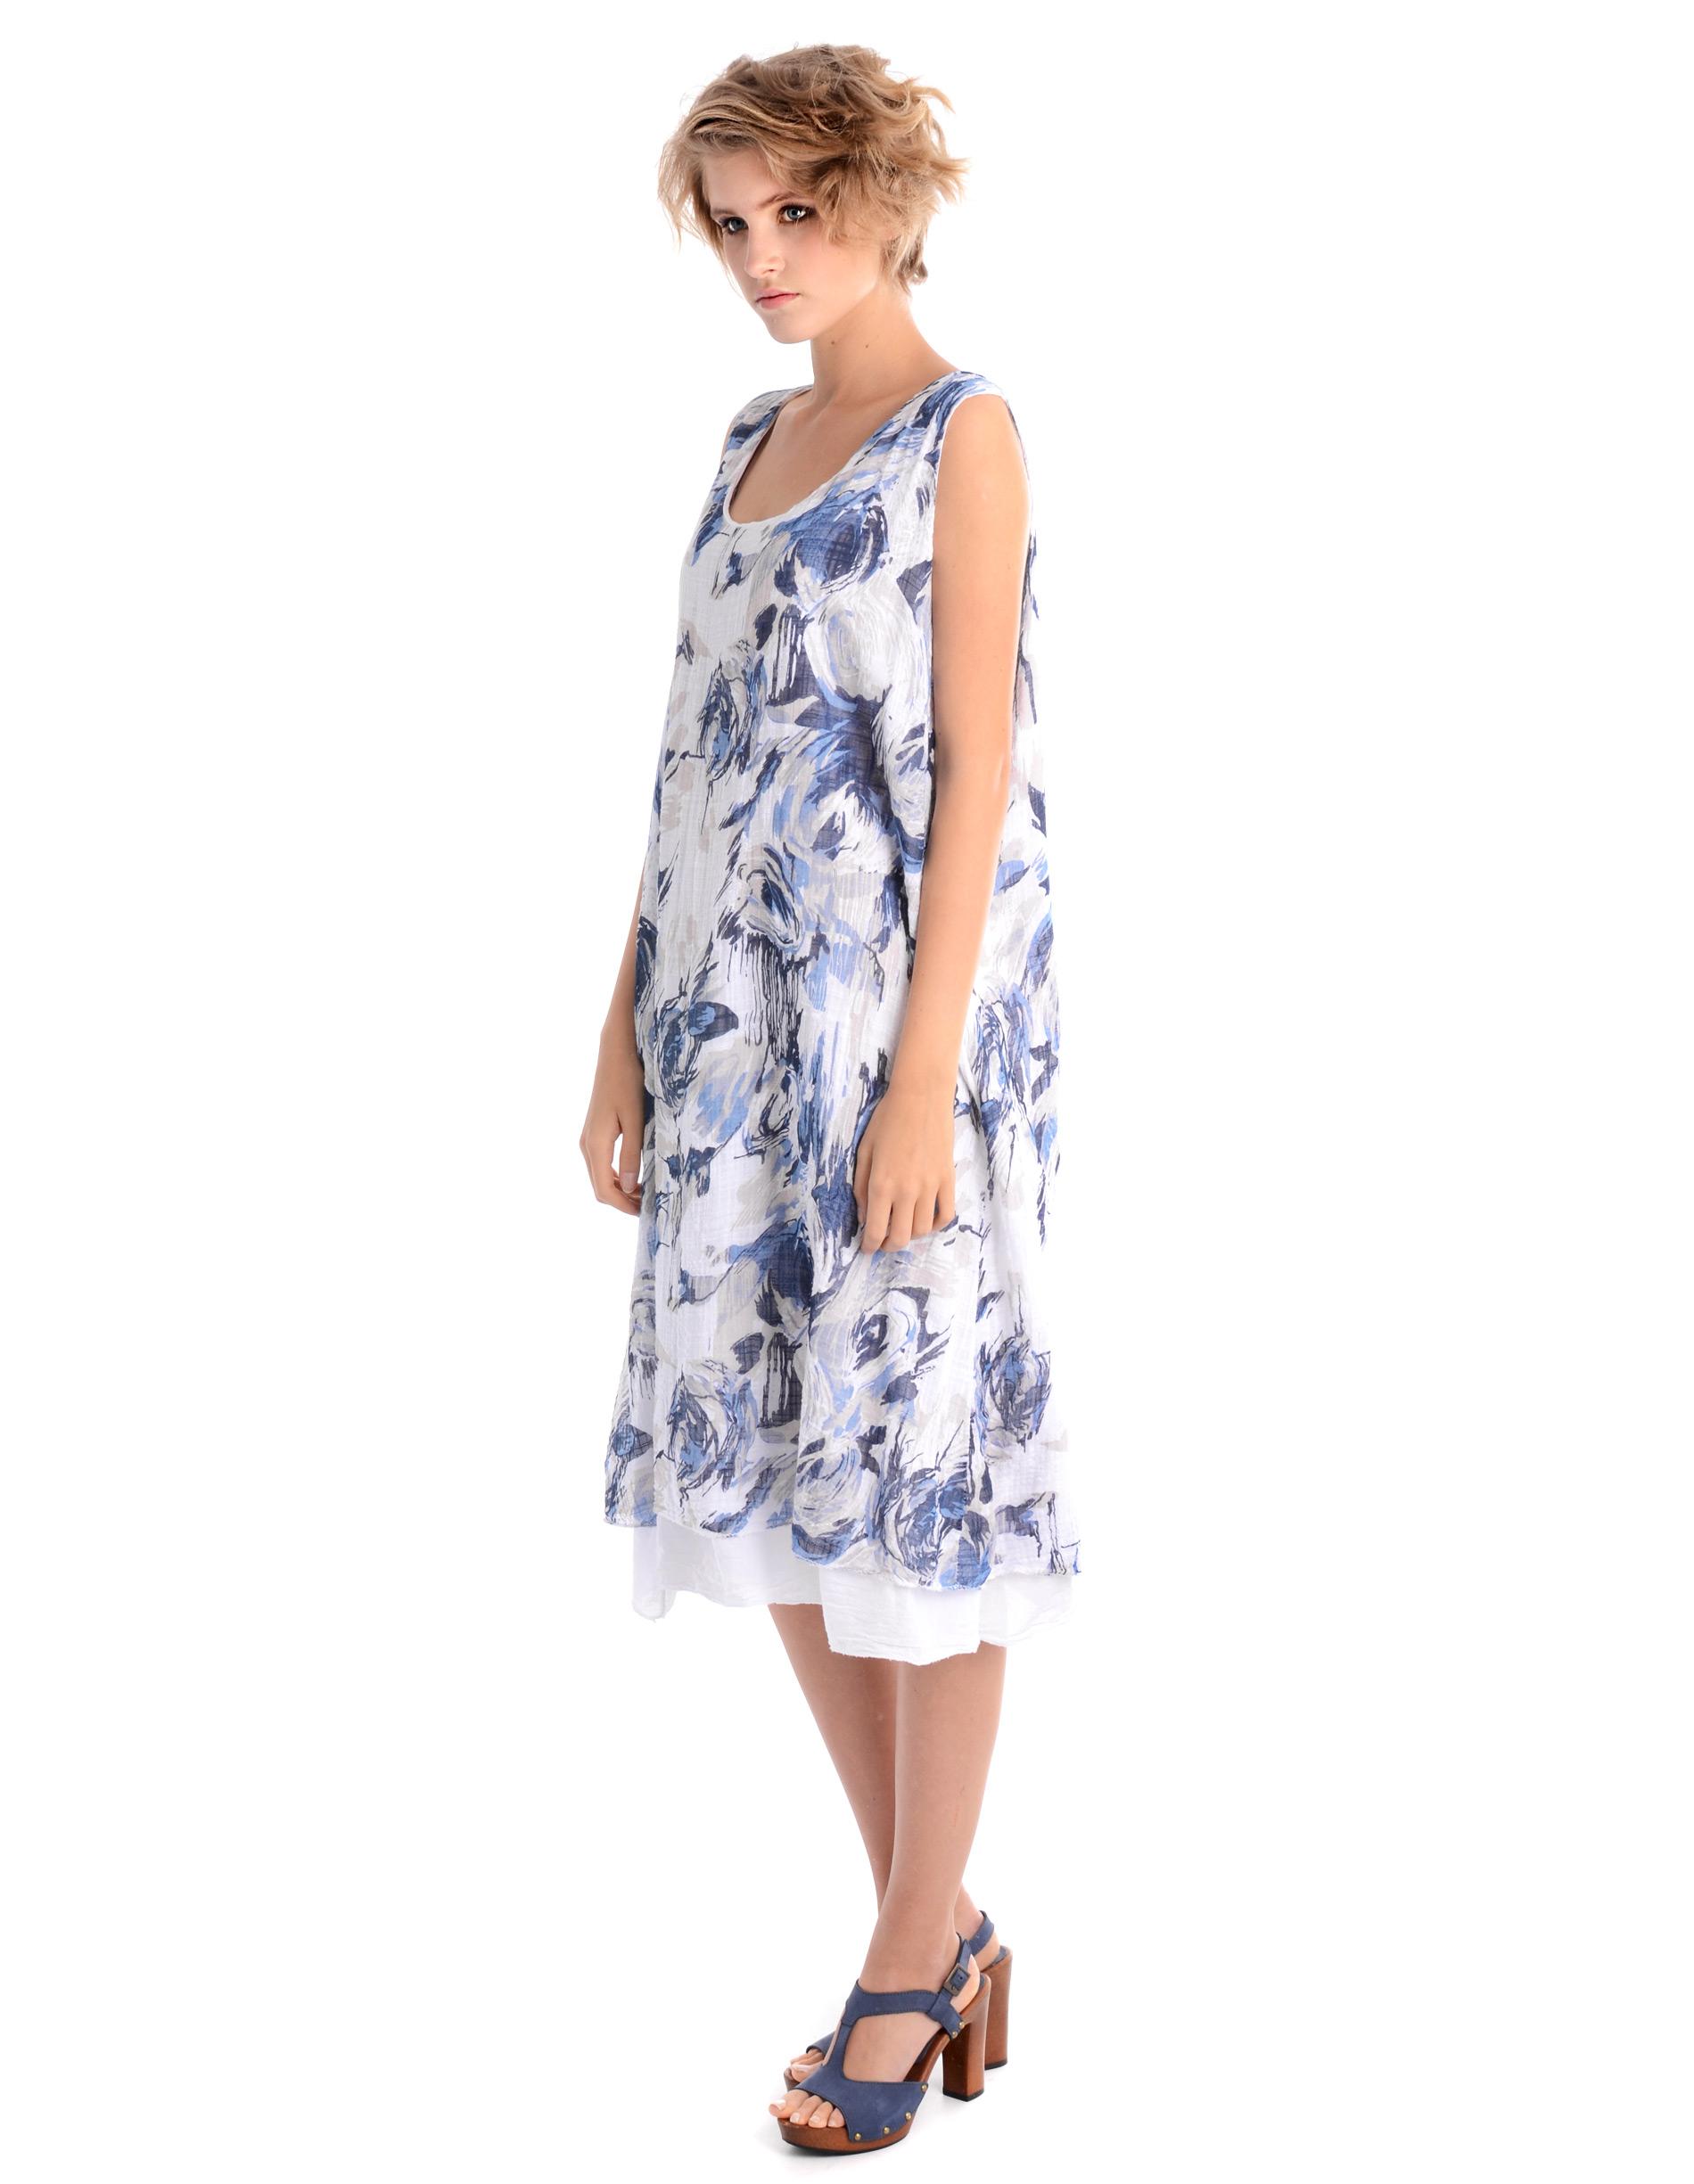 Sukienka - 52-11348 BIAN - Unisono